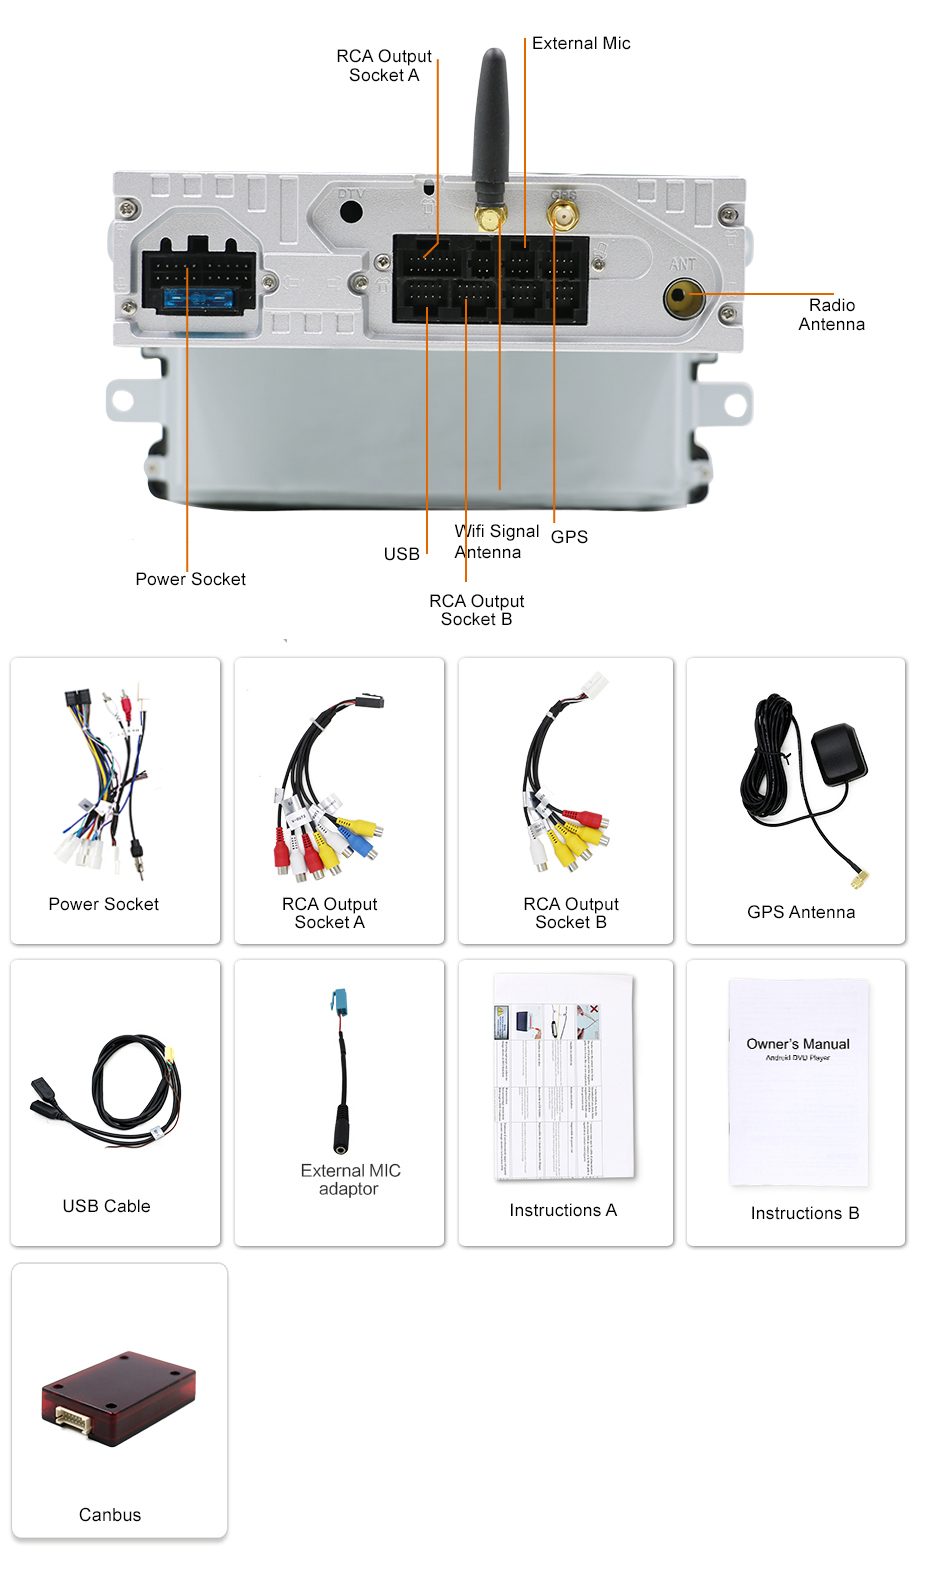 HTB1ahEgaEvrK1RjSszfq6xJNVXaR - Quad Core Pure Android 7.1 GPS Navigator Radio car dvd For Dacia Renault Duster Logan Sandero stereo Central Cassette Player